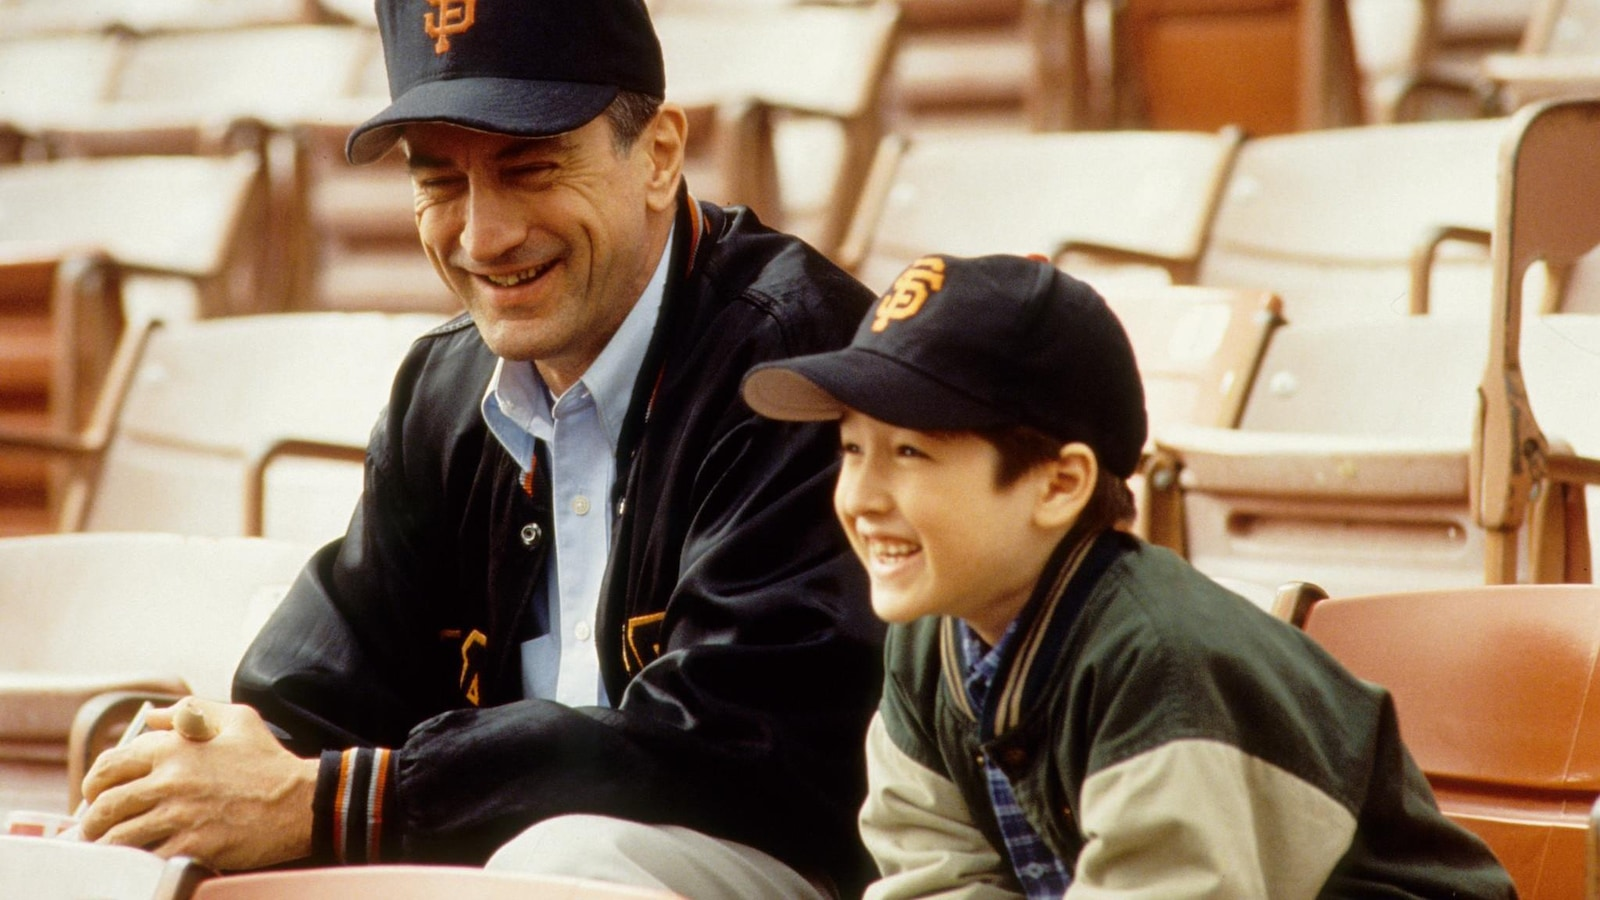 Robert de Niro et l'acteur qui joue son fils